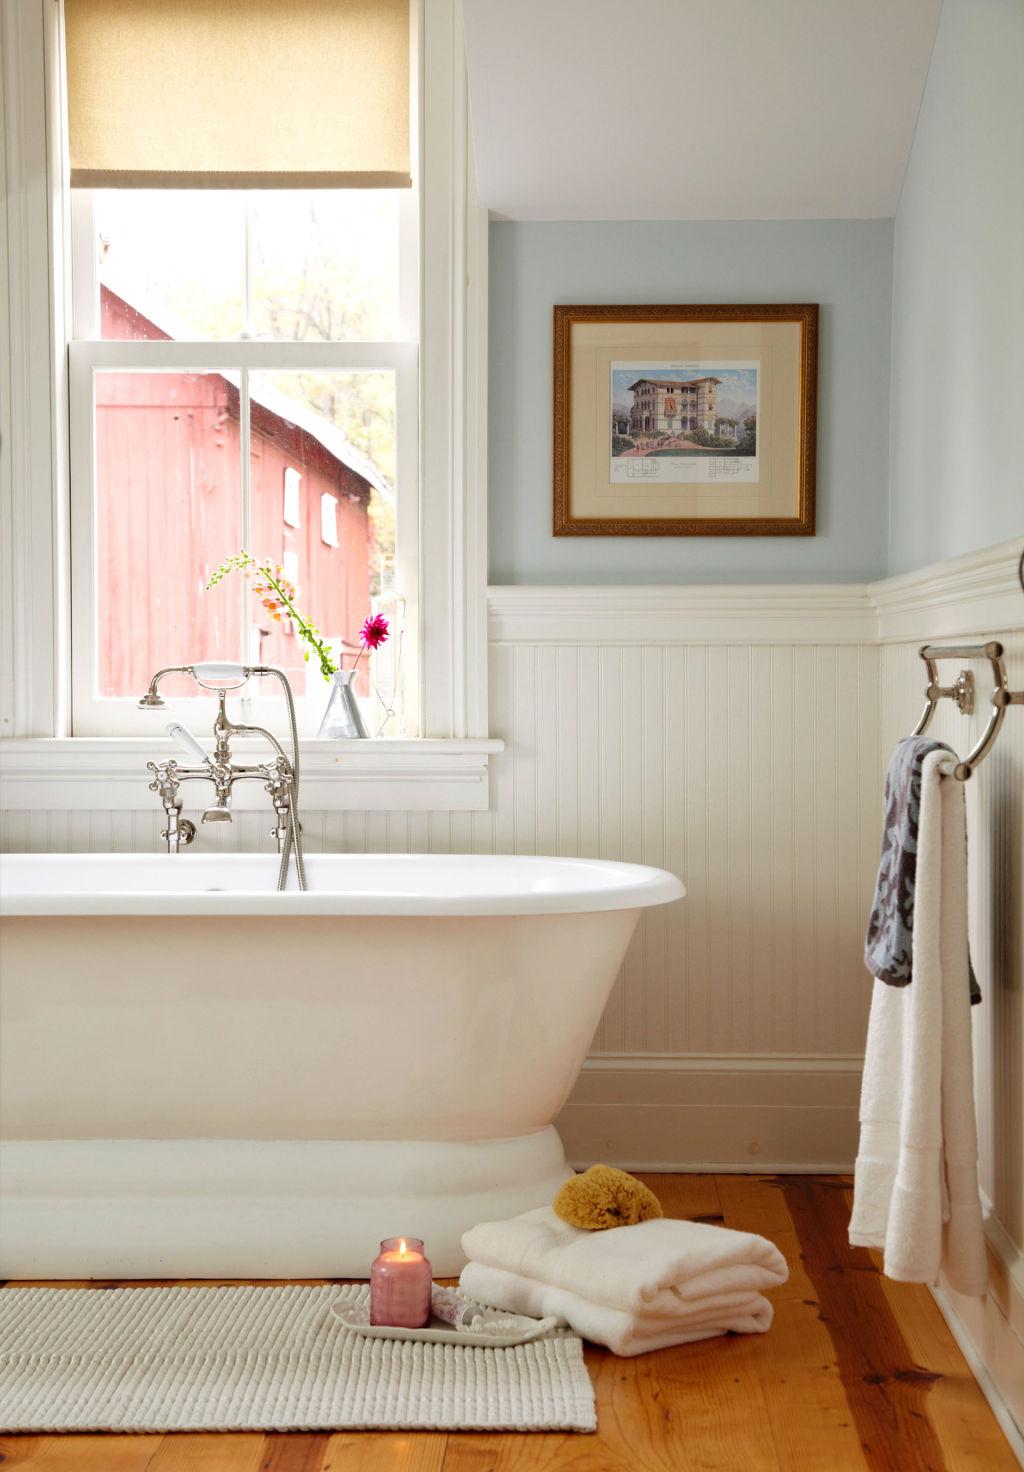 Bathroom decor bathroom decorating ideas for Country living bathroom designs